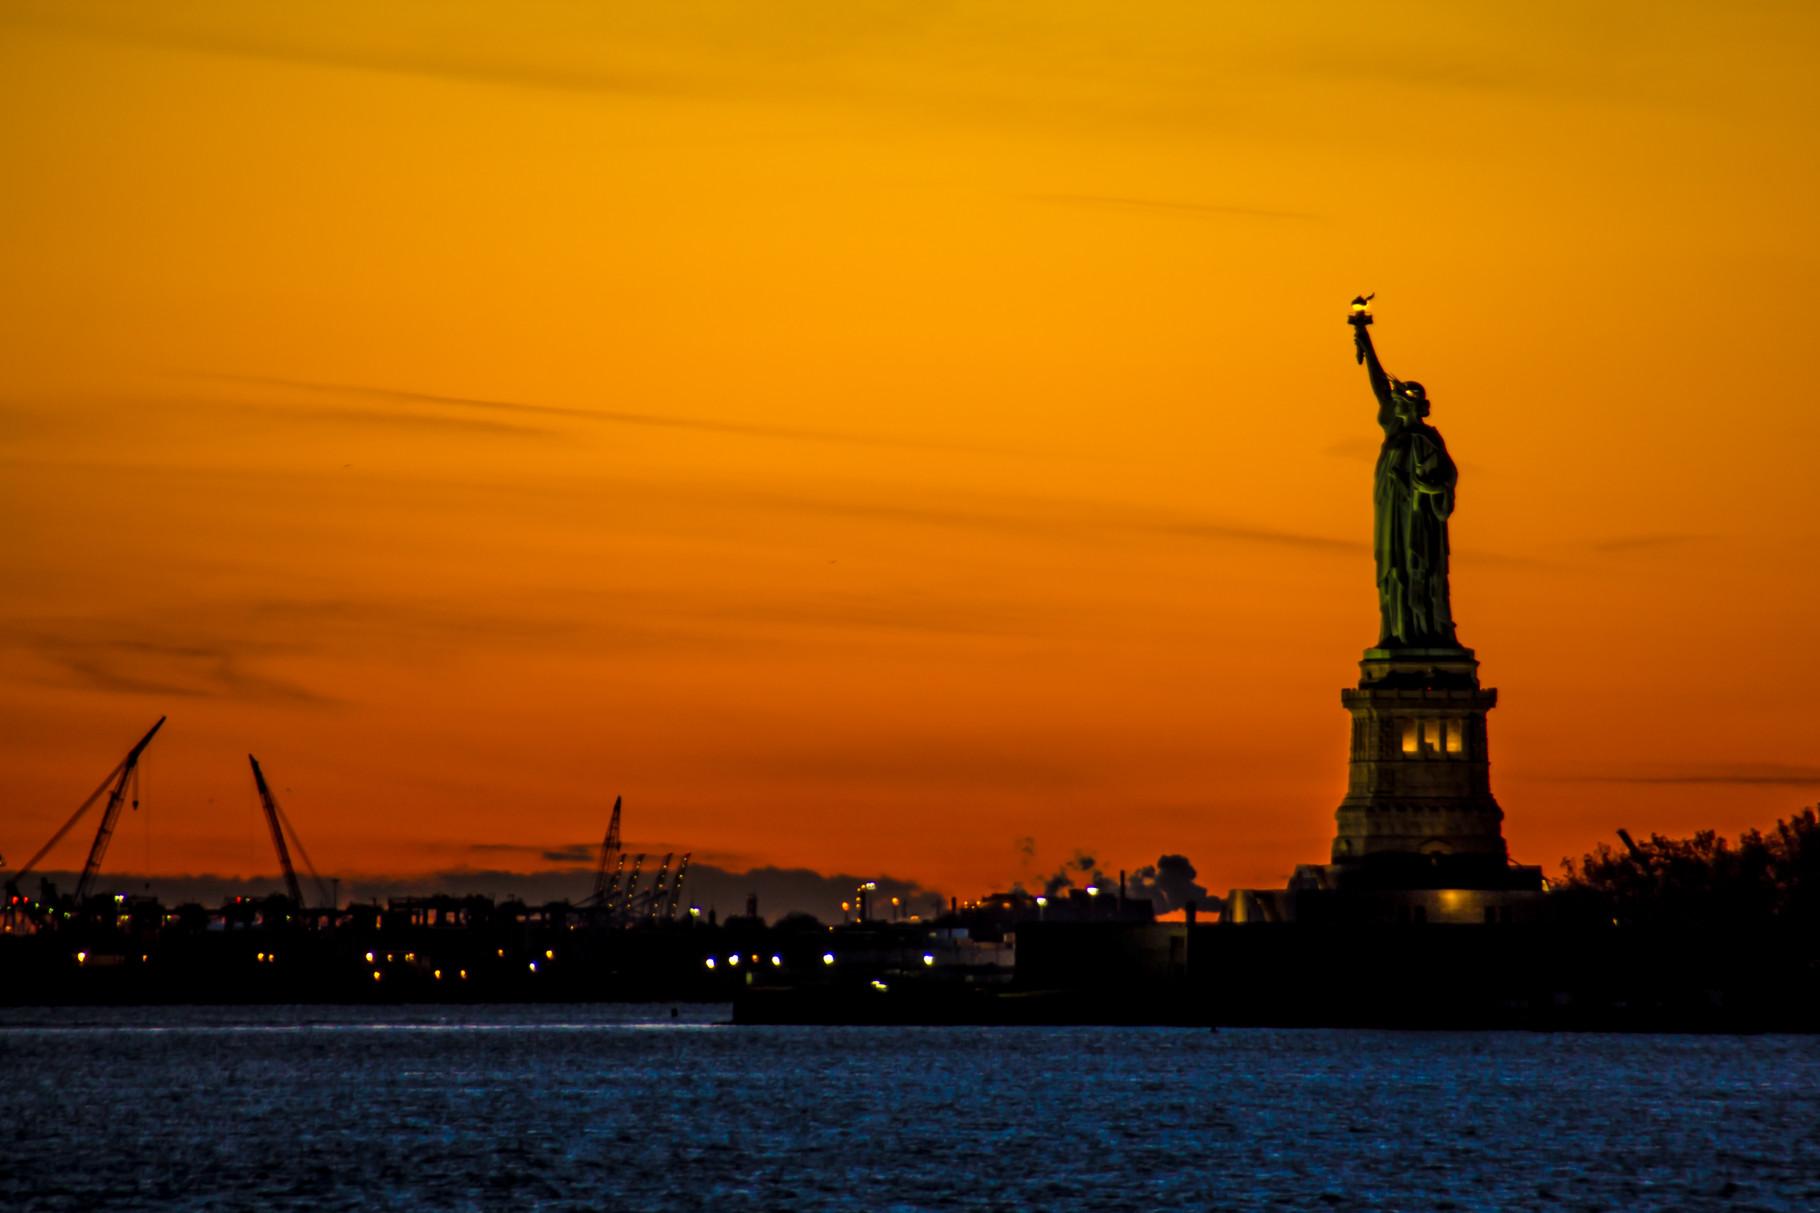 23_NYC Statue of Liberty (Freiheitsstatue).